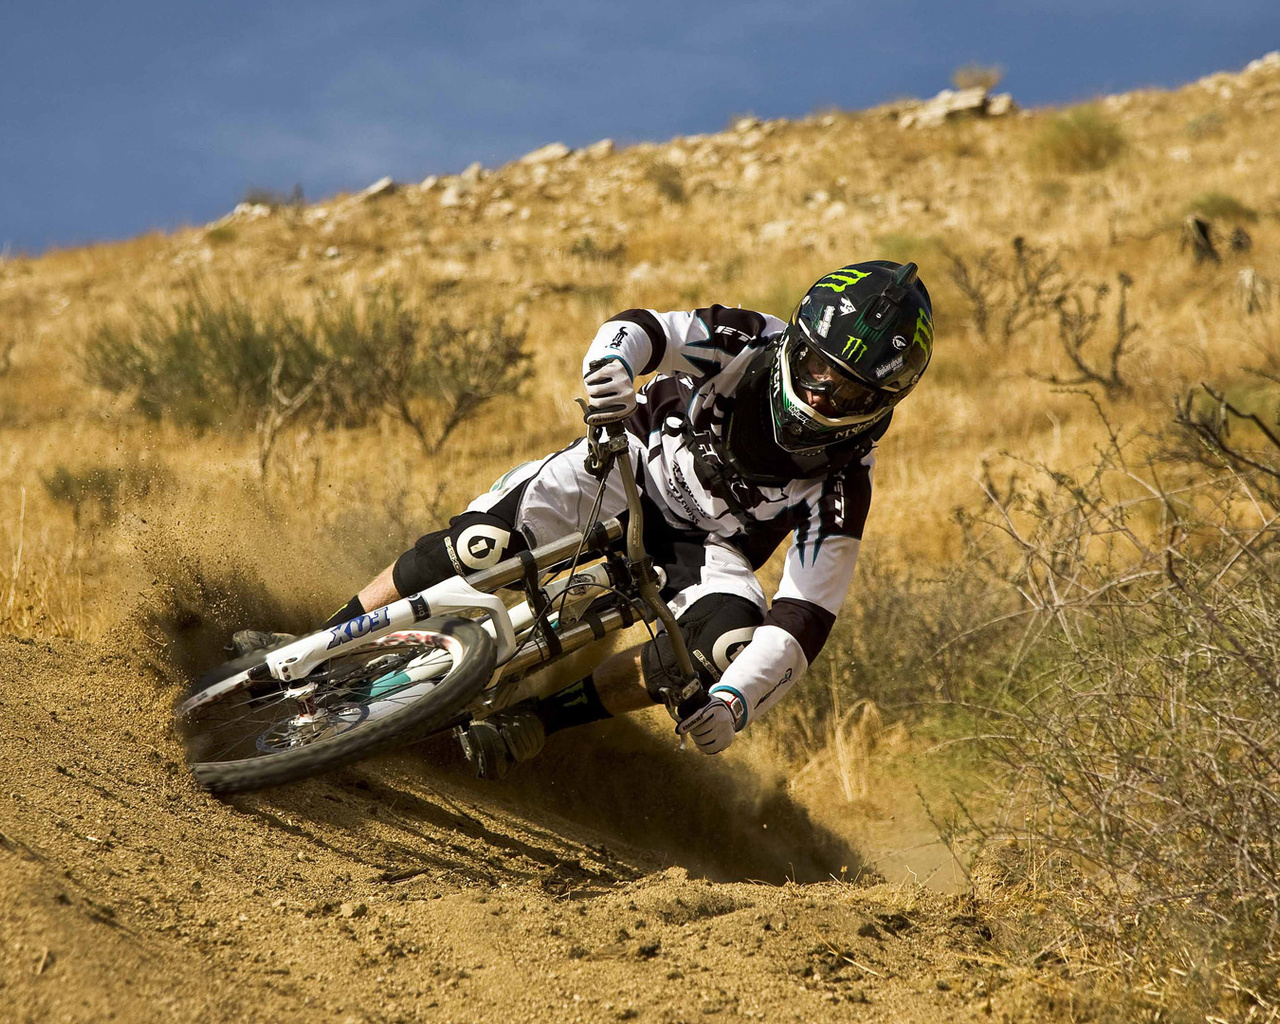 MTB wallpapers Mountainbike Downhill Descent Helmet Sand Sport 1280x1024